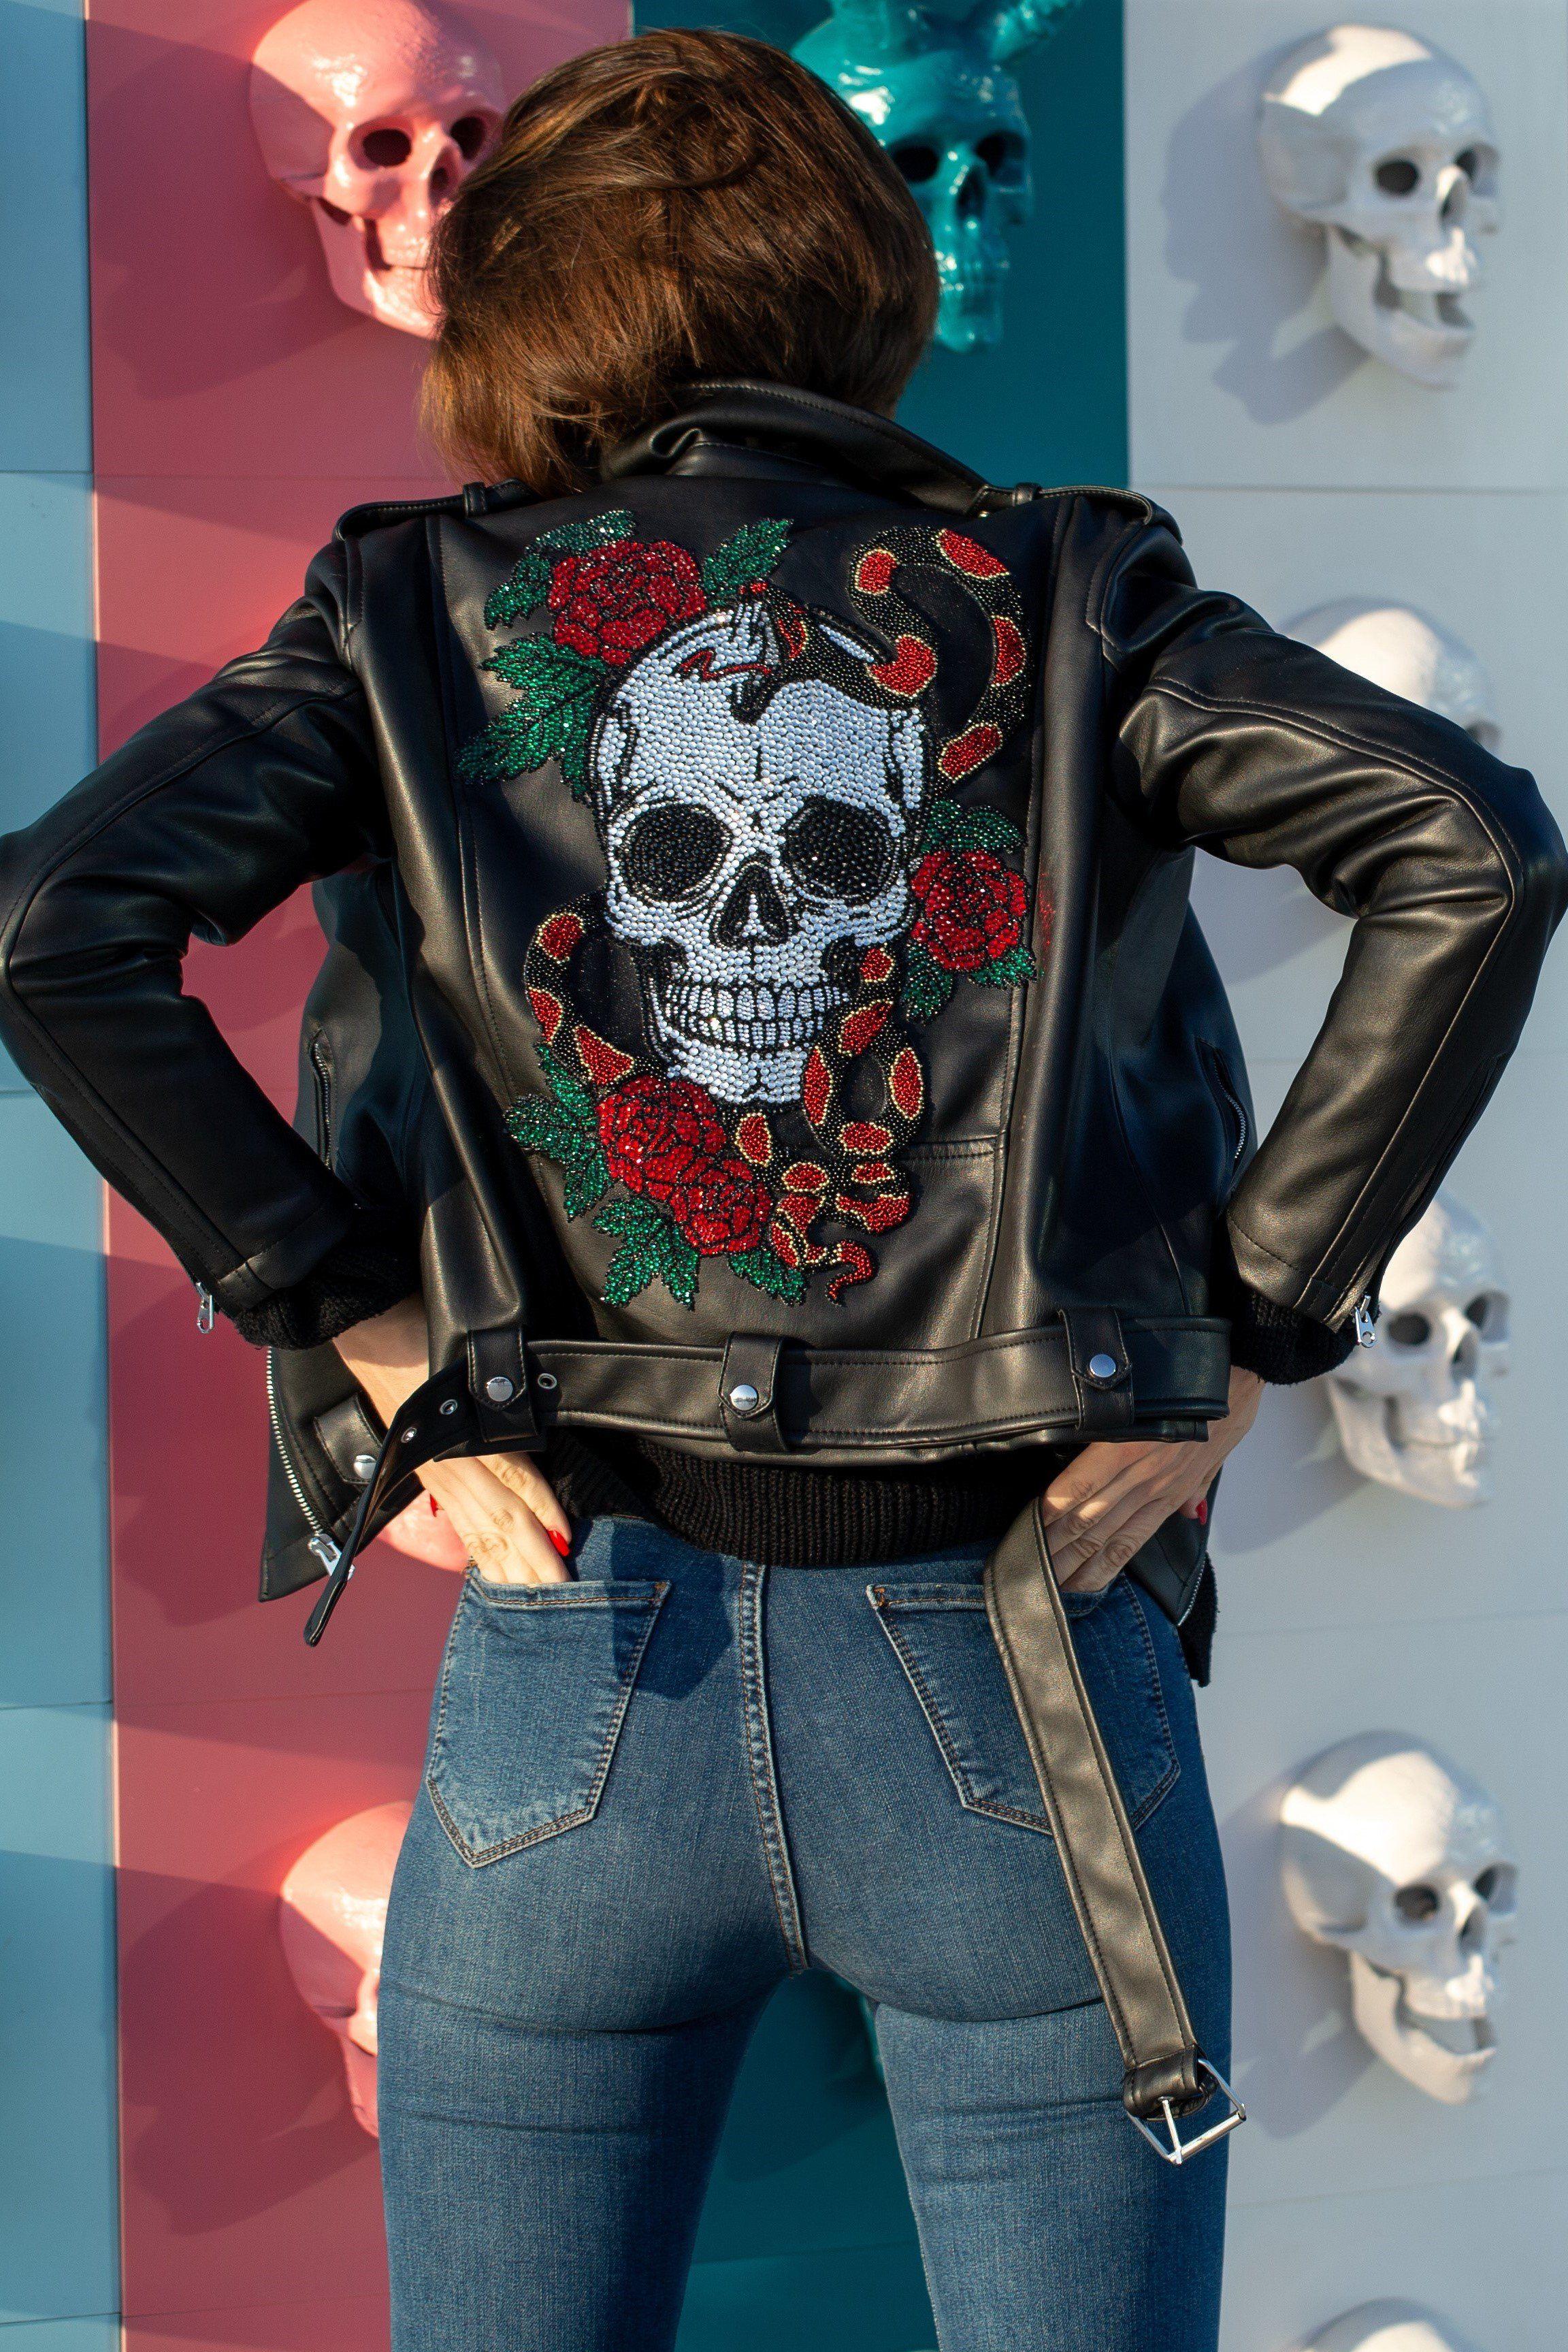 Crystal Skull Roses Biker Jacket Black Leather Jacket In 2021 Punk Jackets Custom Leather Jackets Jacket Outfits [ 3455 x 2304 Pixel ]